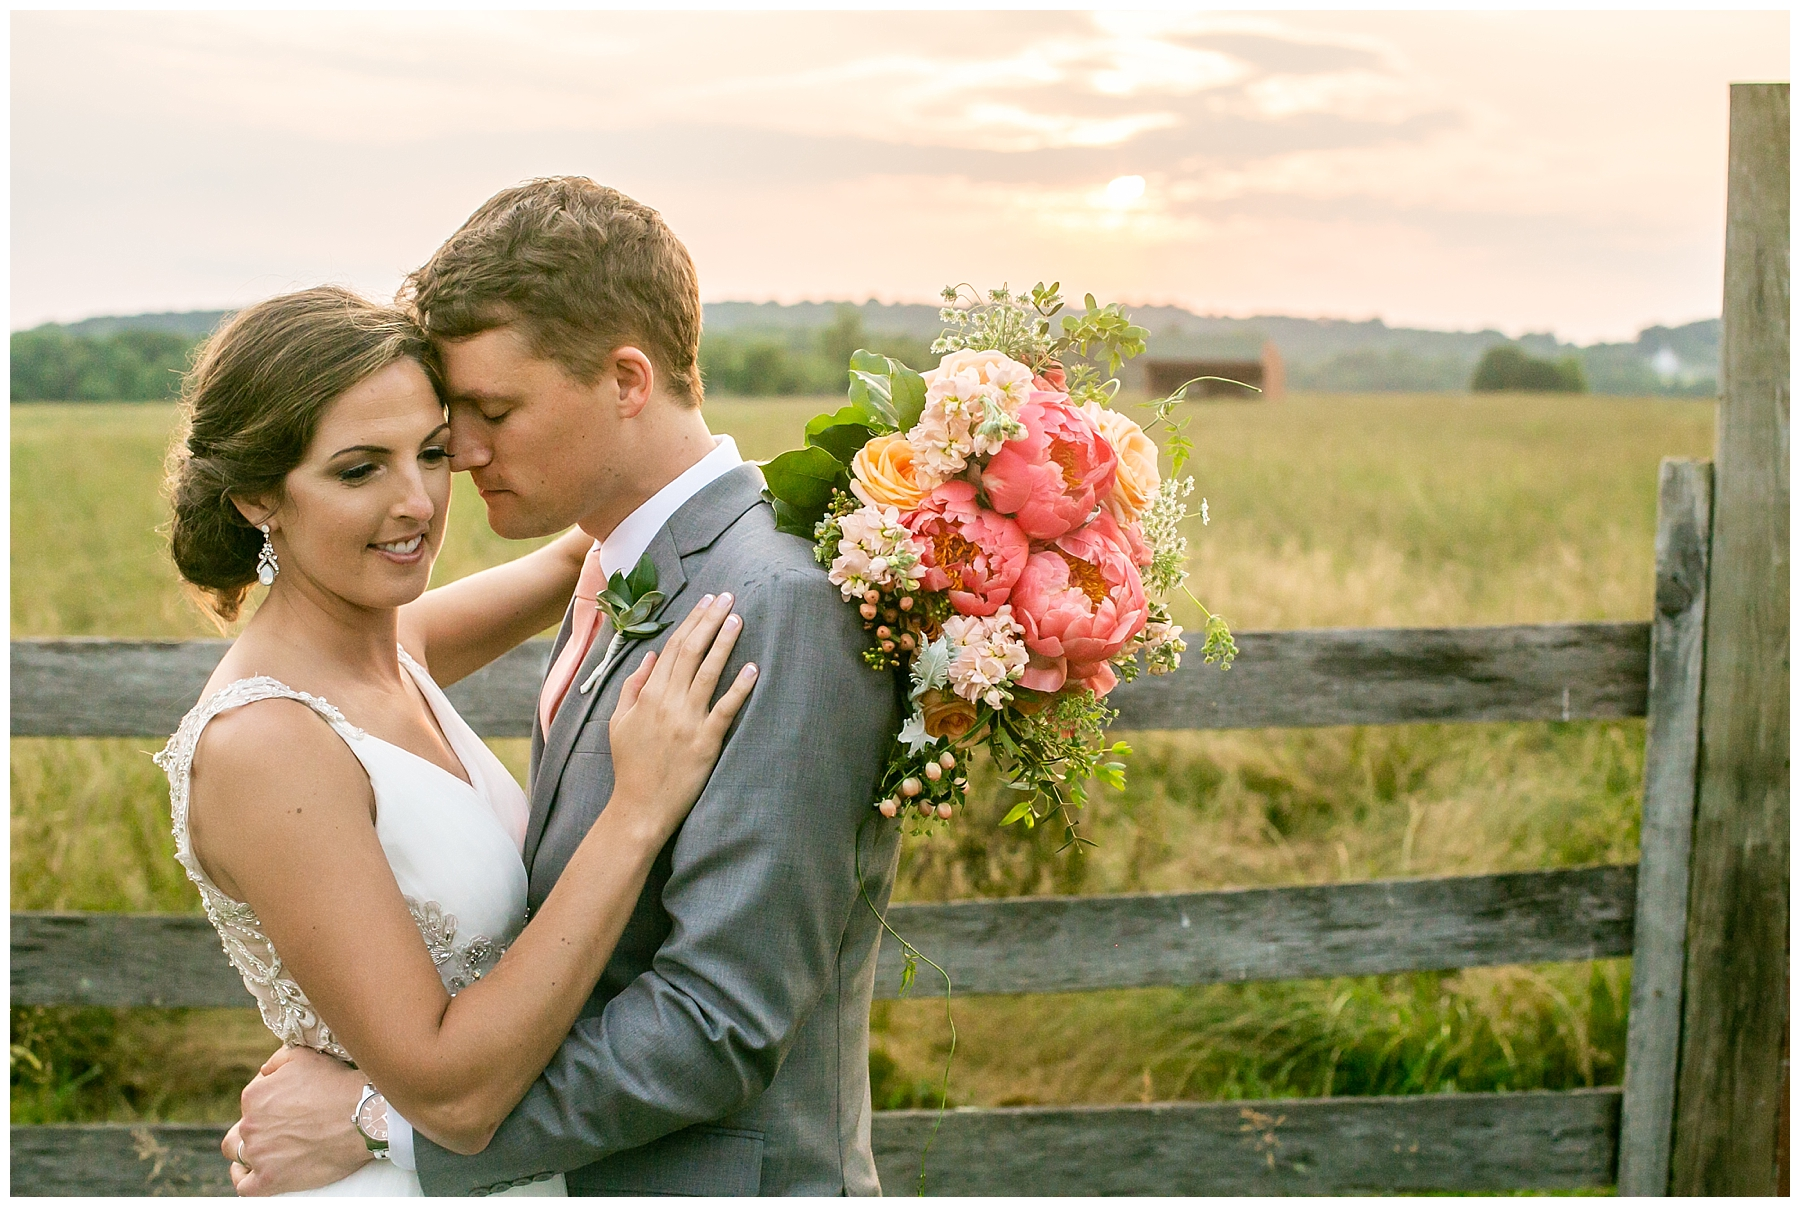 Bohemia River Overlook Wedding | Baltimore Best Wedding Photographers | Baltimore Weddings | Pink Bridesmaids Dresses | Peony Bouquet | Living Radiant Photography